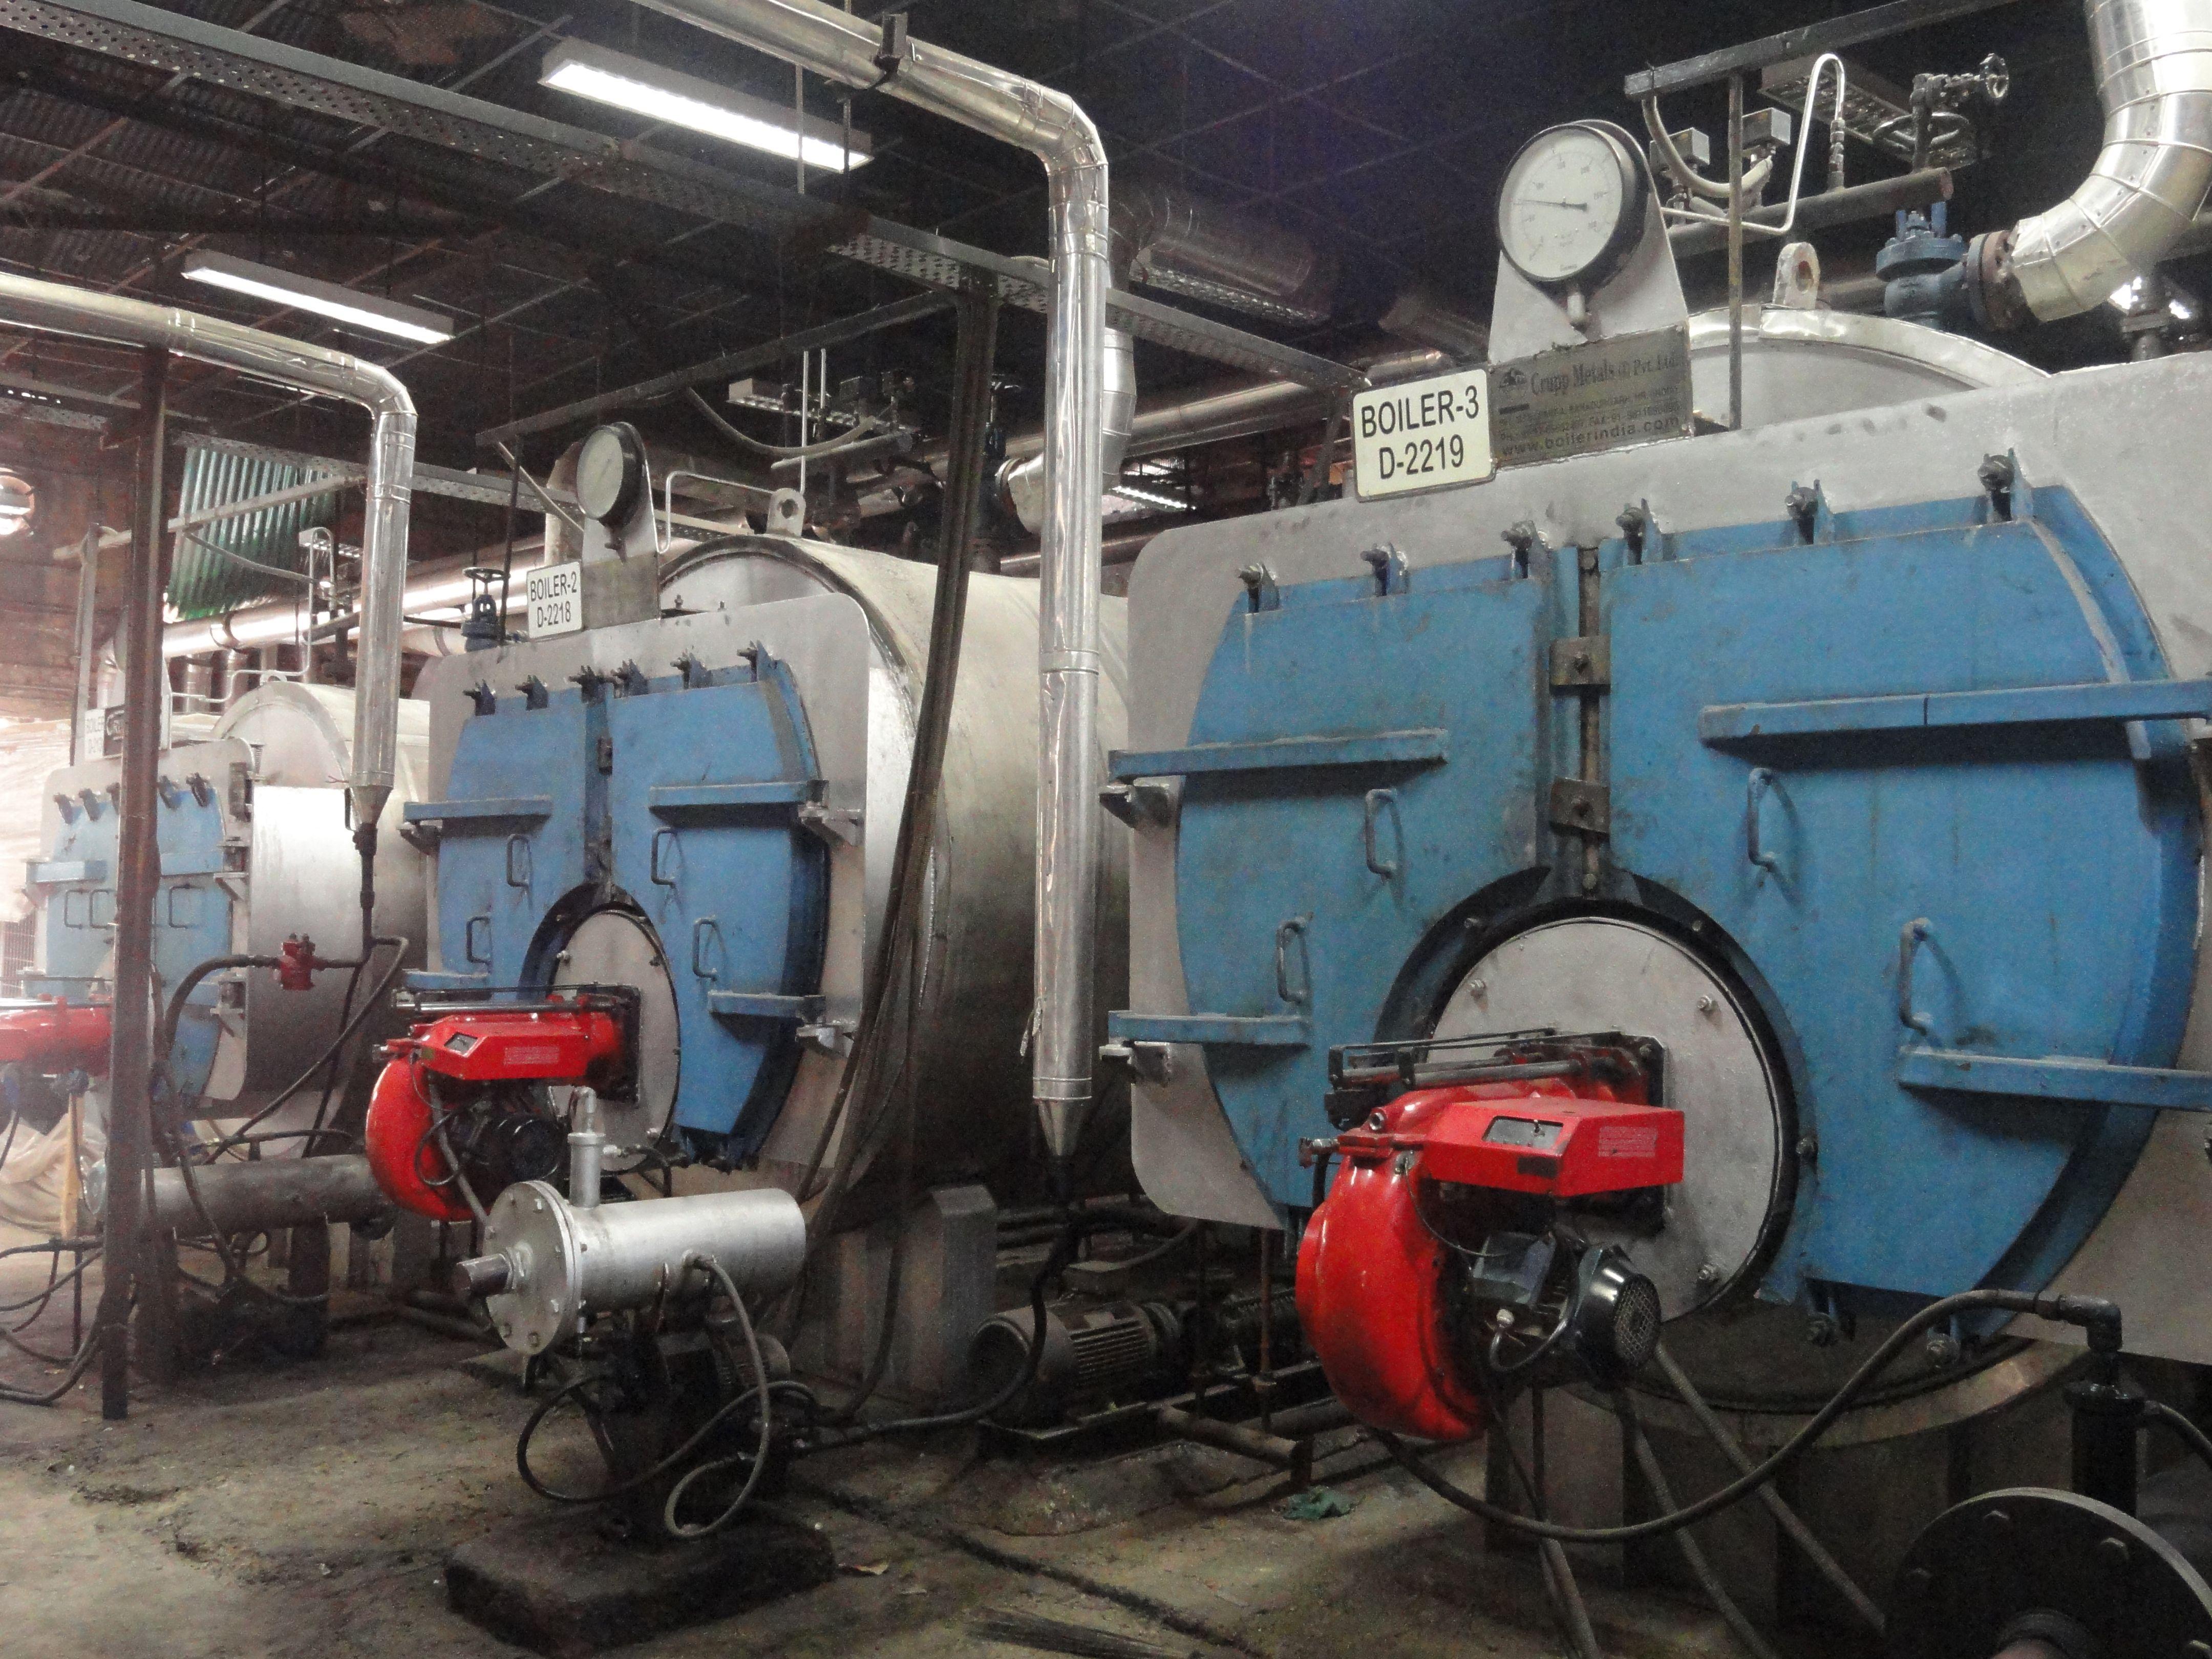 Industrial Boilers Steam Boilers Hot Water Boilers Wood Boilers Cng Boilers Oil Boilers Www Boilerindia Com Motor Electrico Electrica